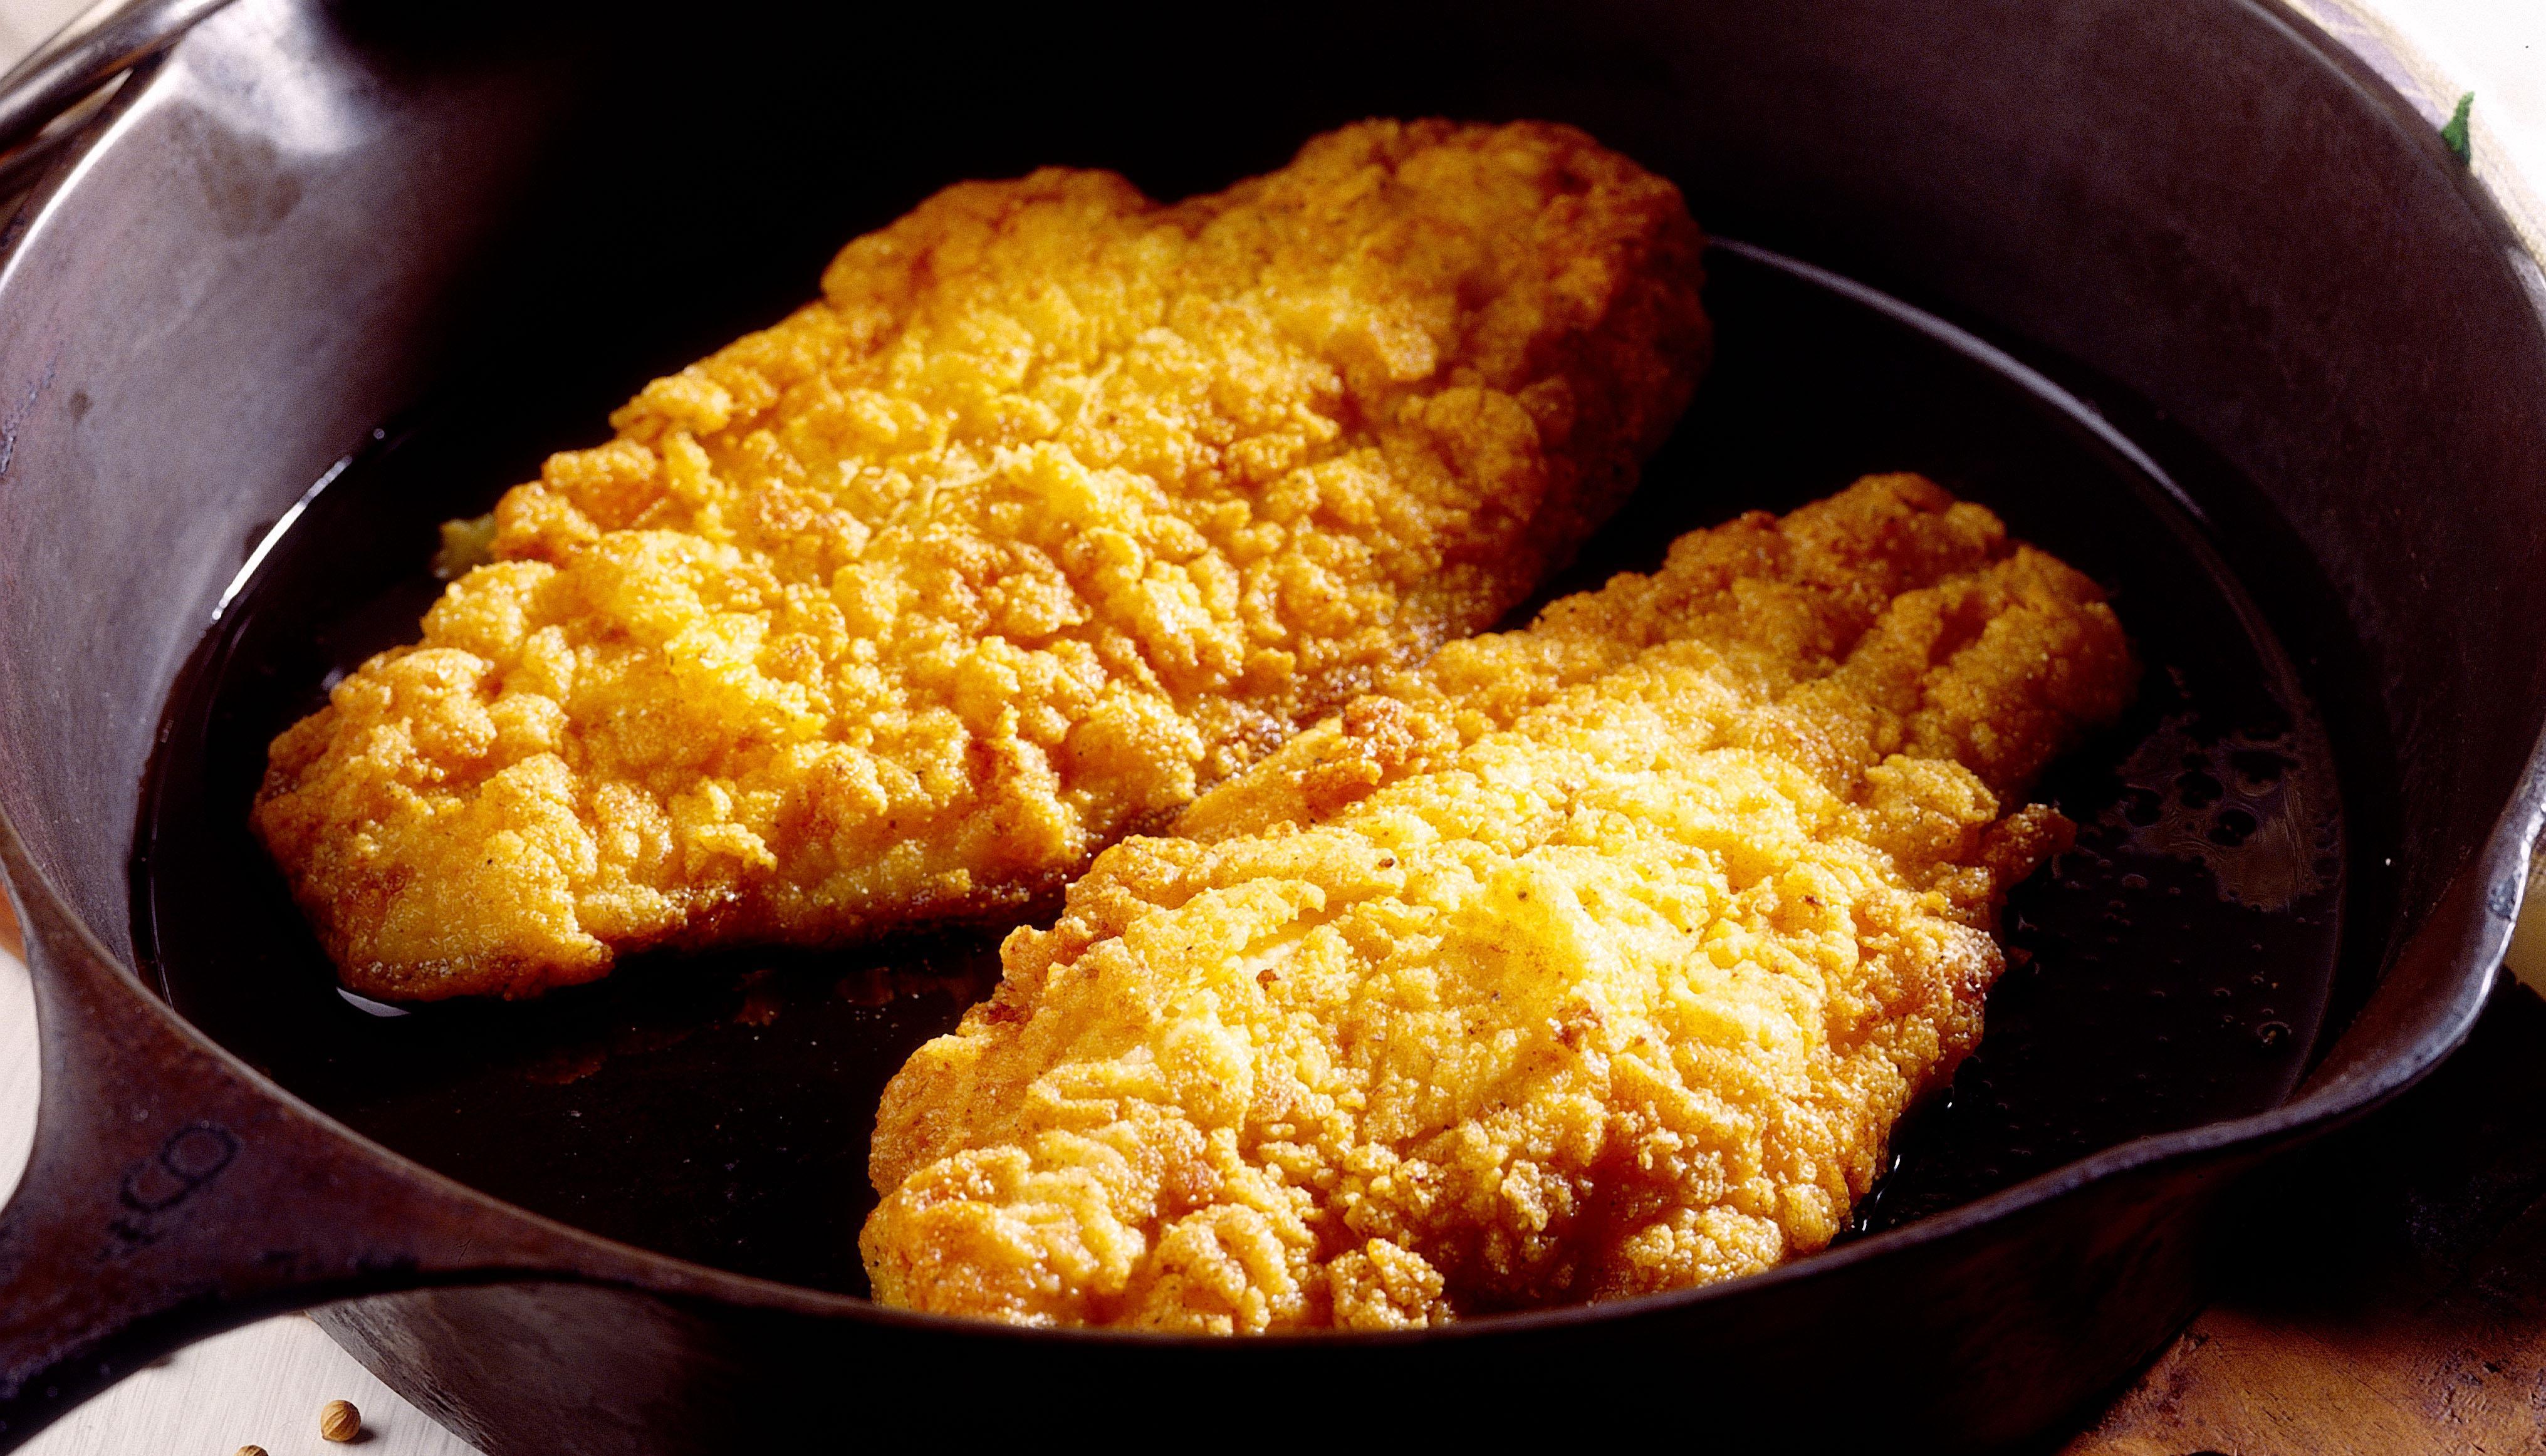 Fried catfish in skillet